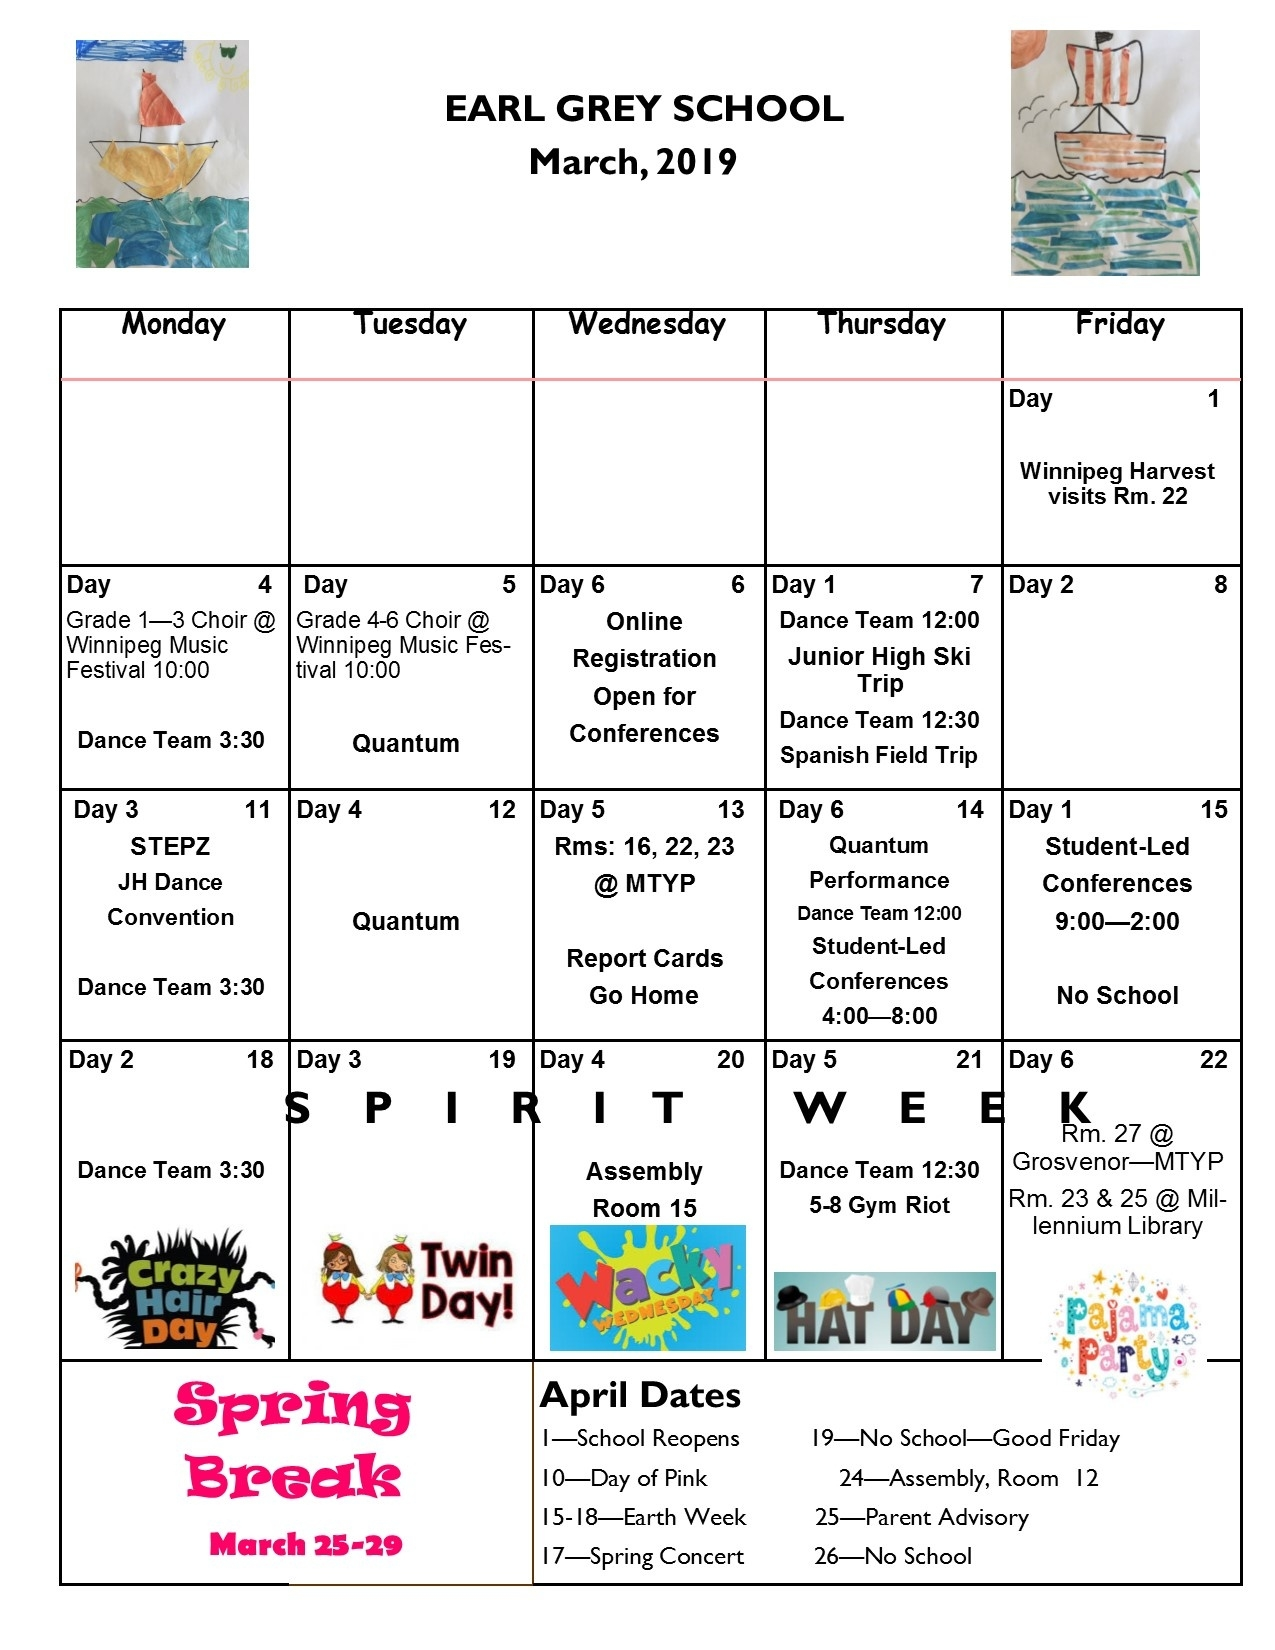 Earl Grey School_6 Day School Calendar Winnipeg